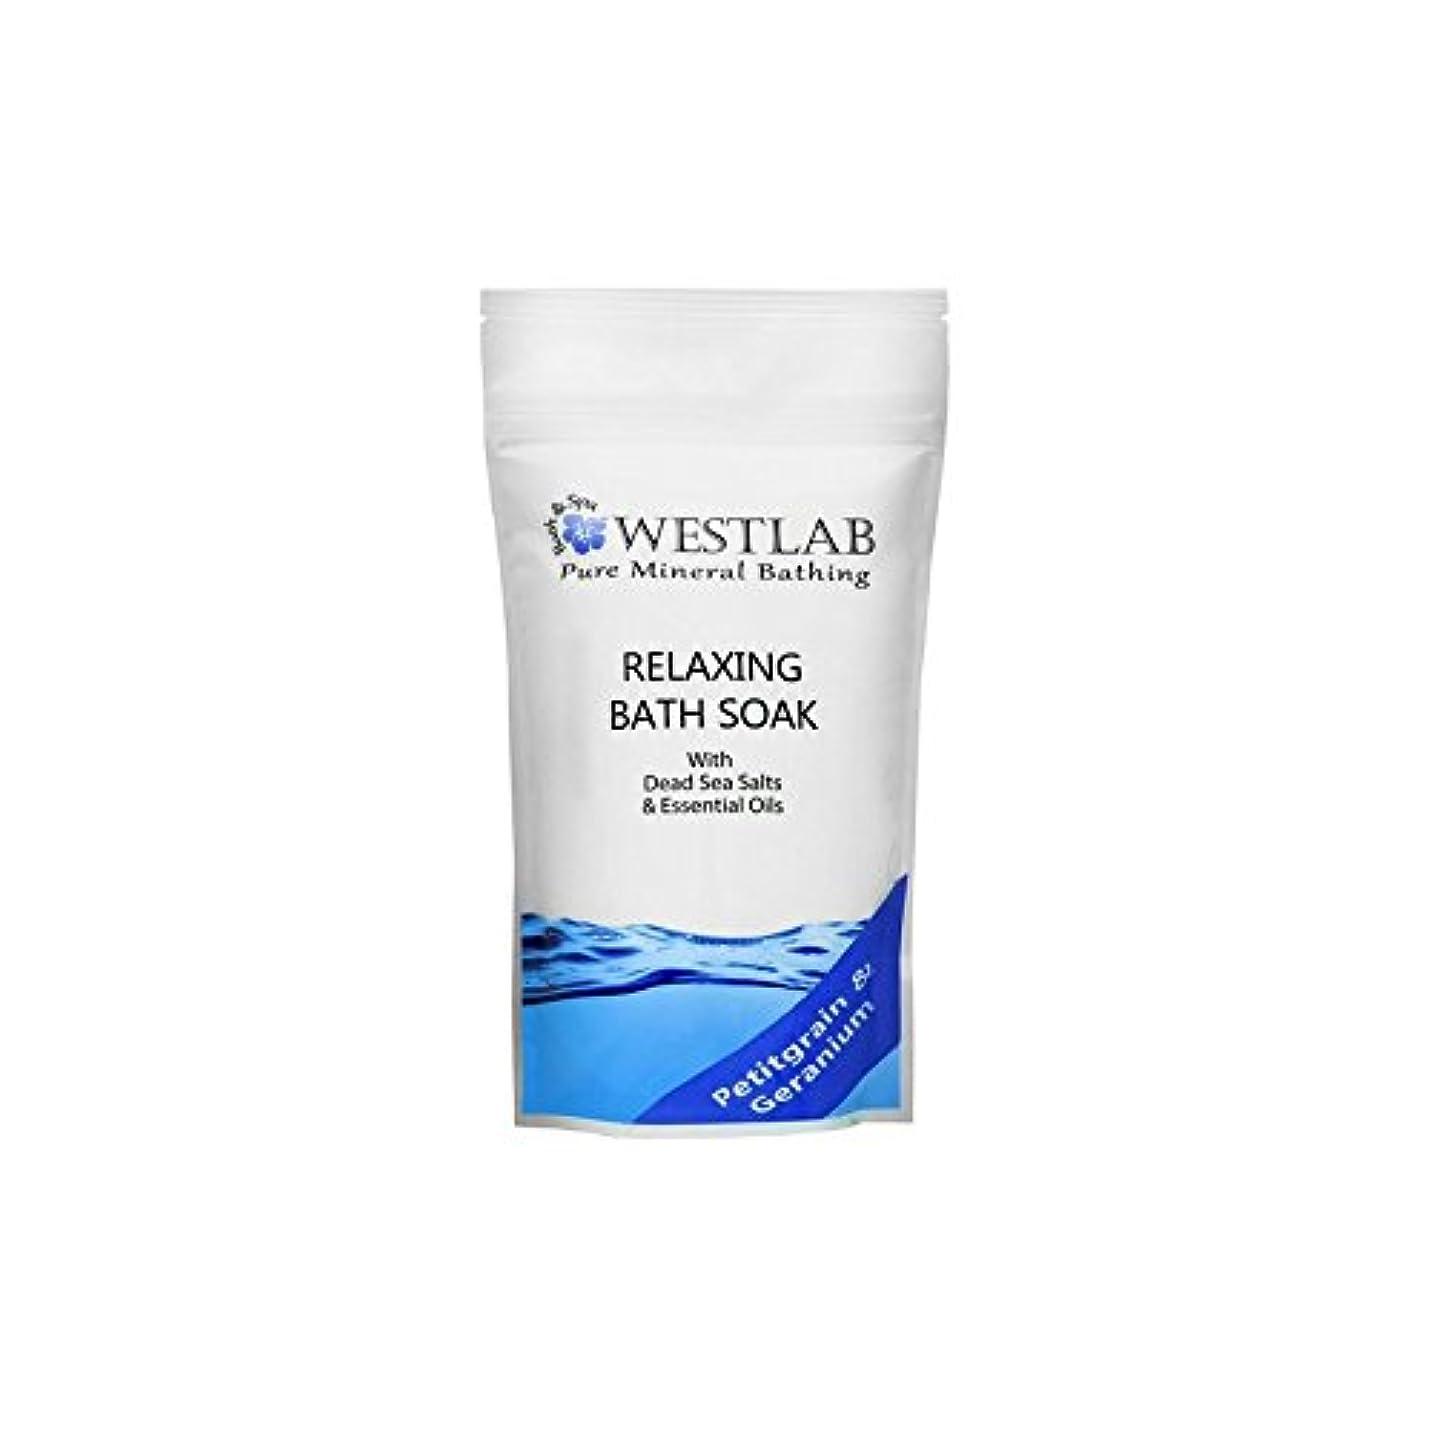 Westlab Relax Dead Sea Salt Bath Soak (500g) (Pack of 6) - 死海の塩浴浸漬(500グラム)をリラックス x6 [並行輸入品]